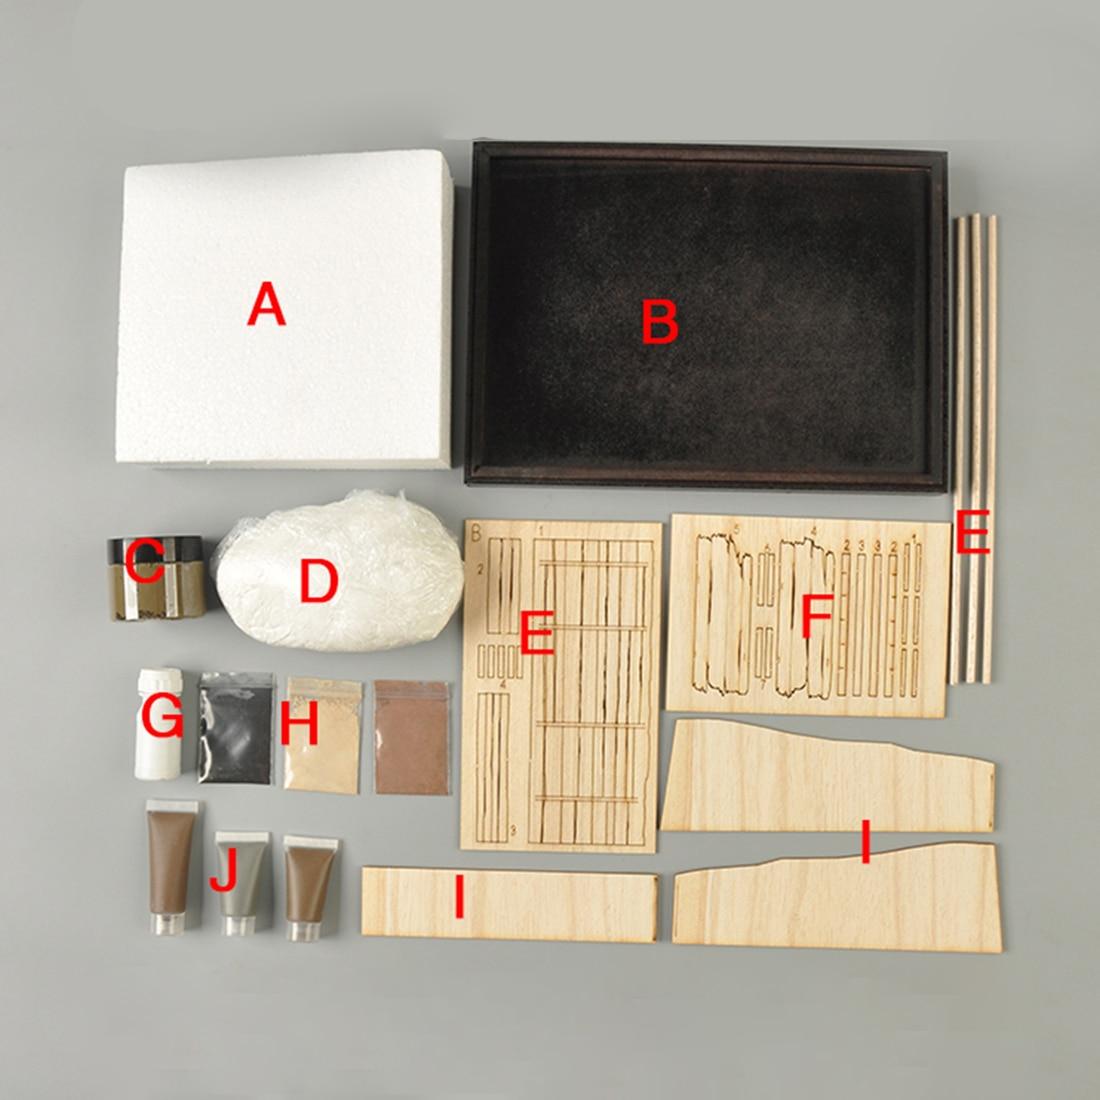 1/35 25 X 18cm DIY Military Sand Table Construction Model Trench Scene Platform Kits 2 Types